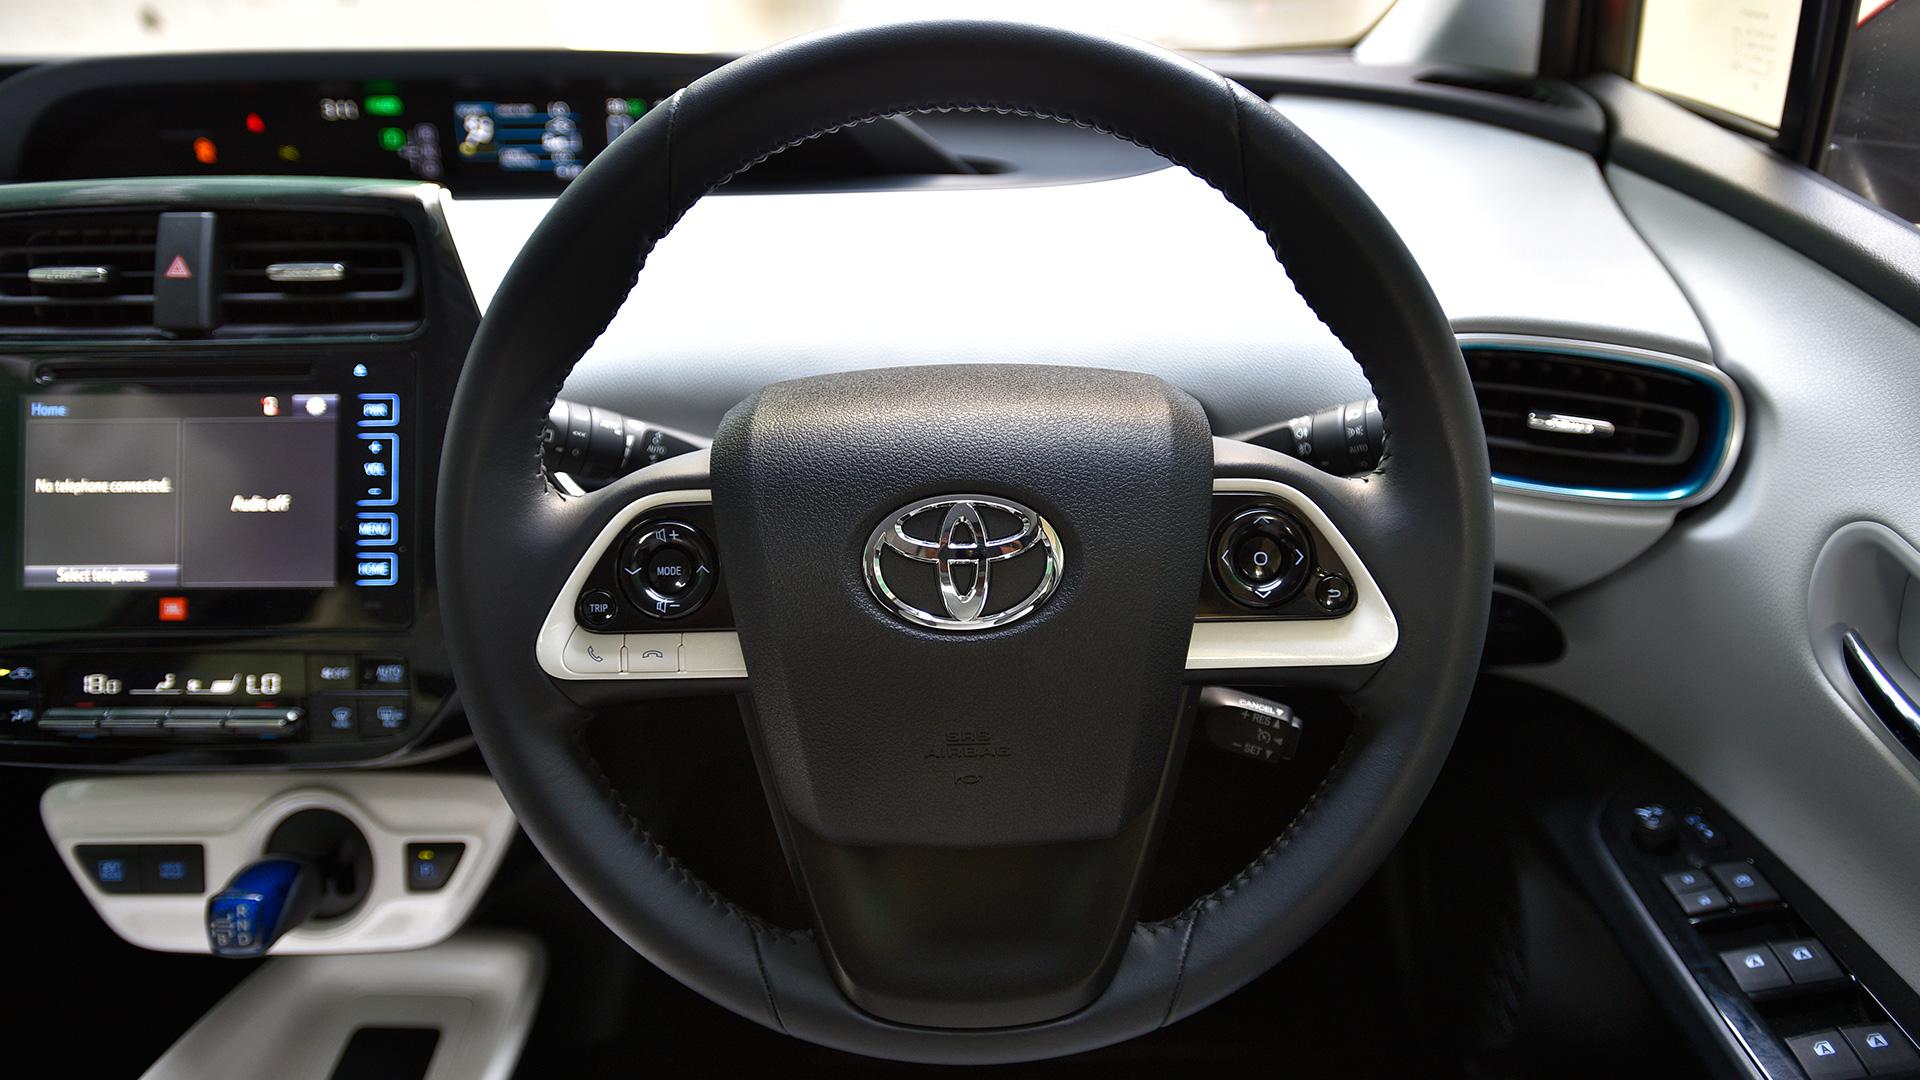 Toyota Prius 2017-1.8 Z8 Interior